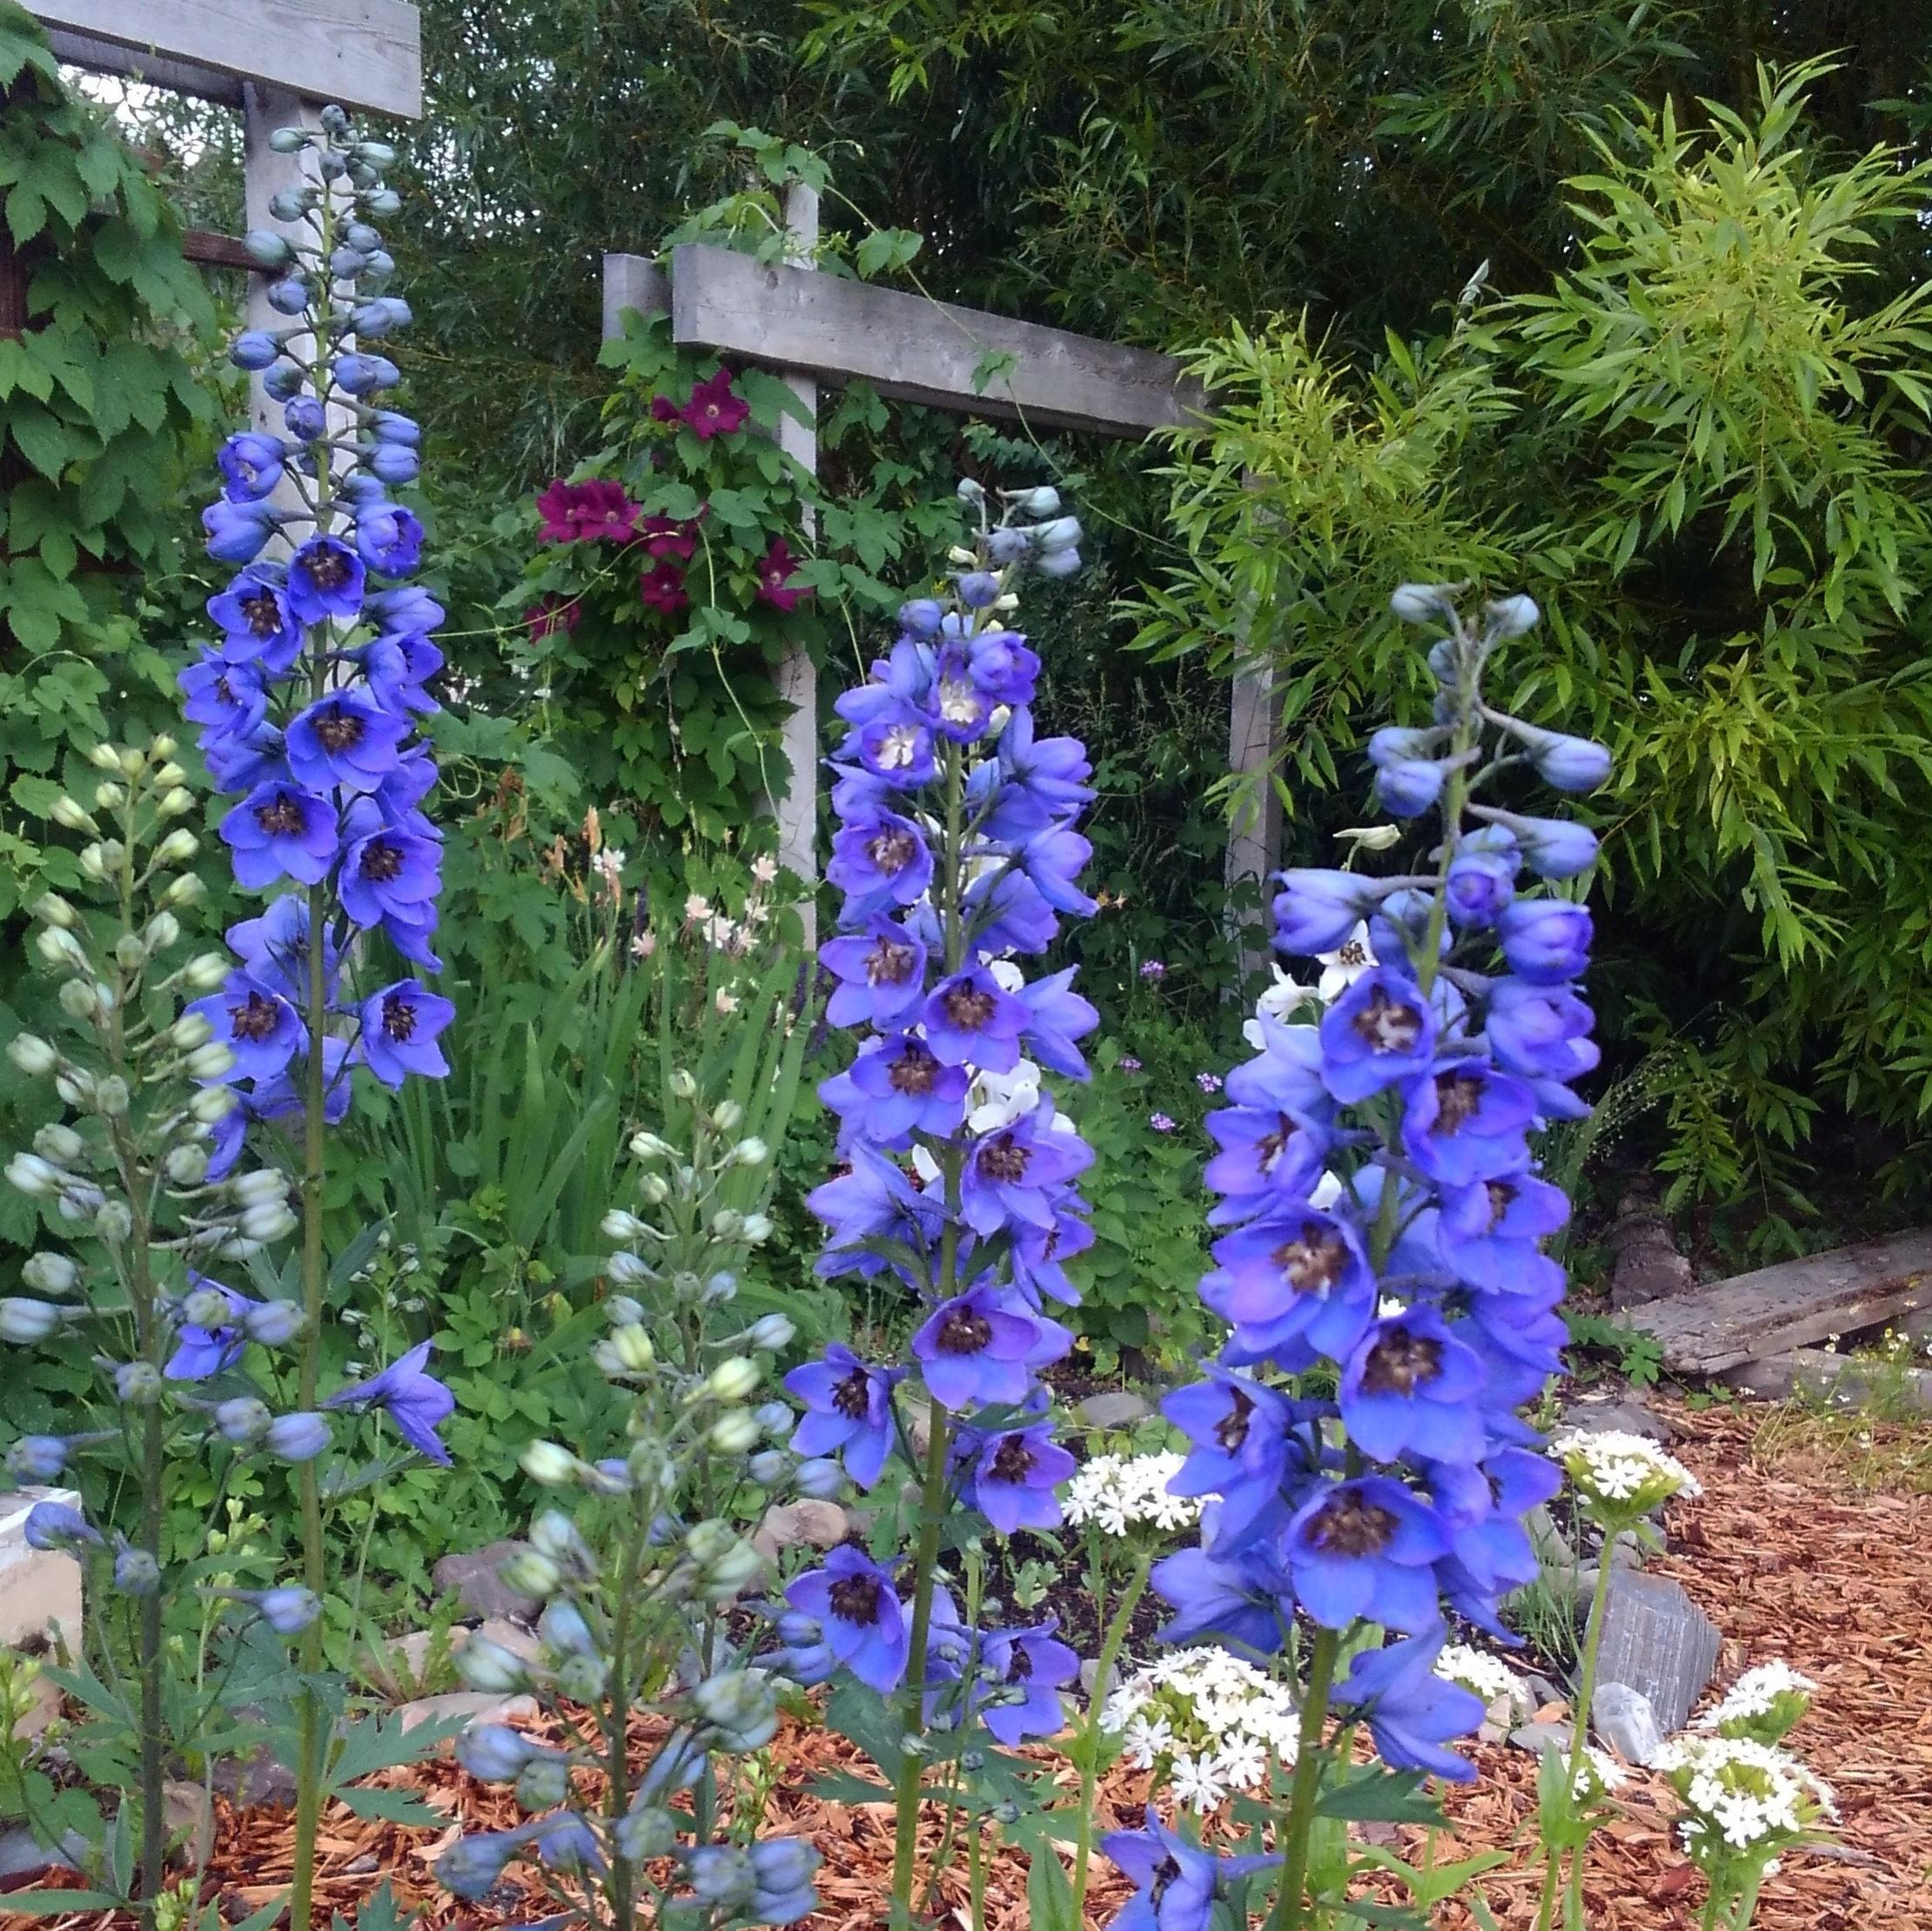 Blue Delphinium Flower Seeds Tall Delphinium Seeds Rare Etsy